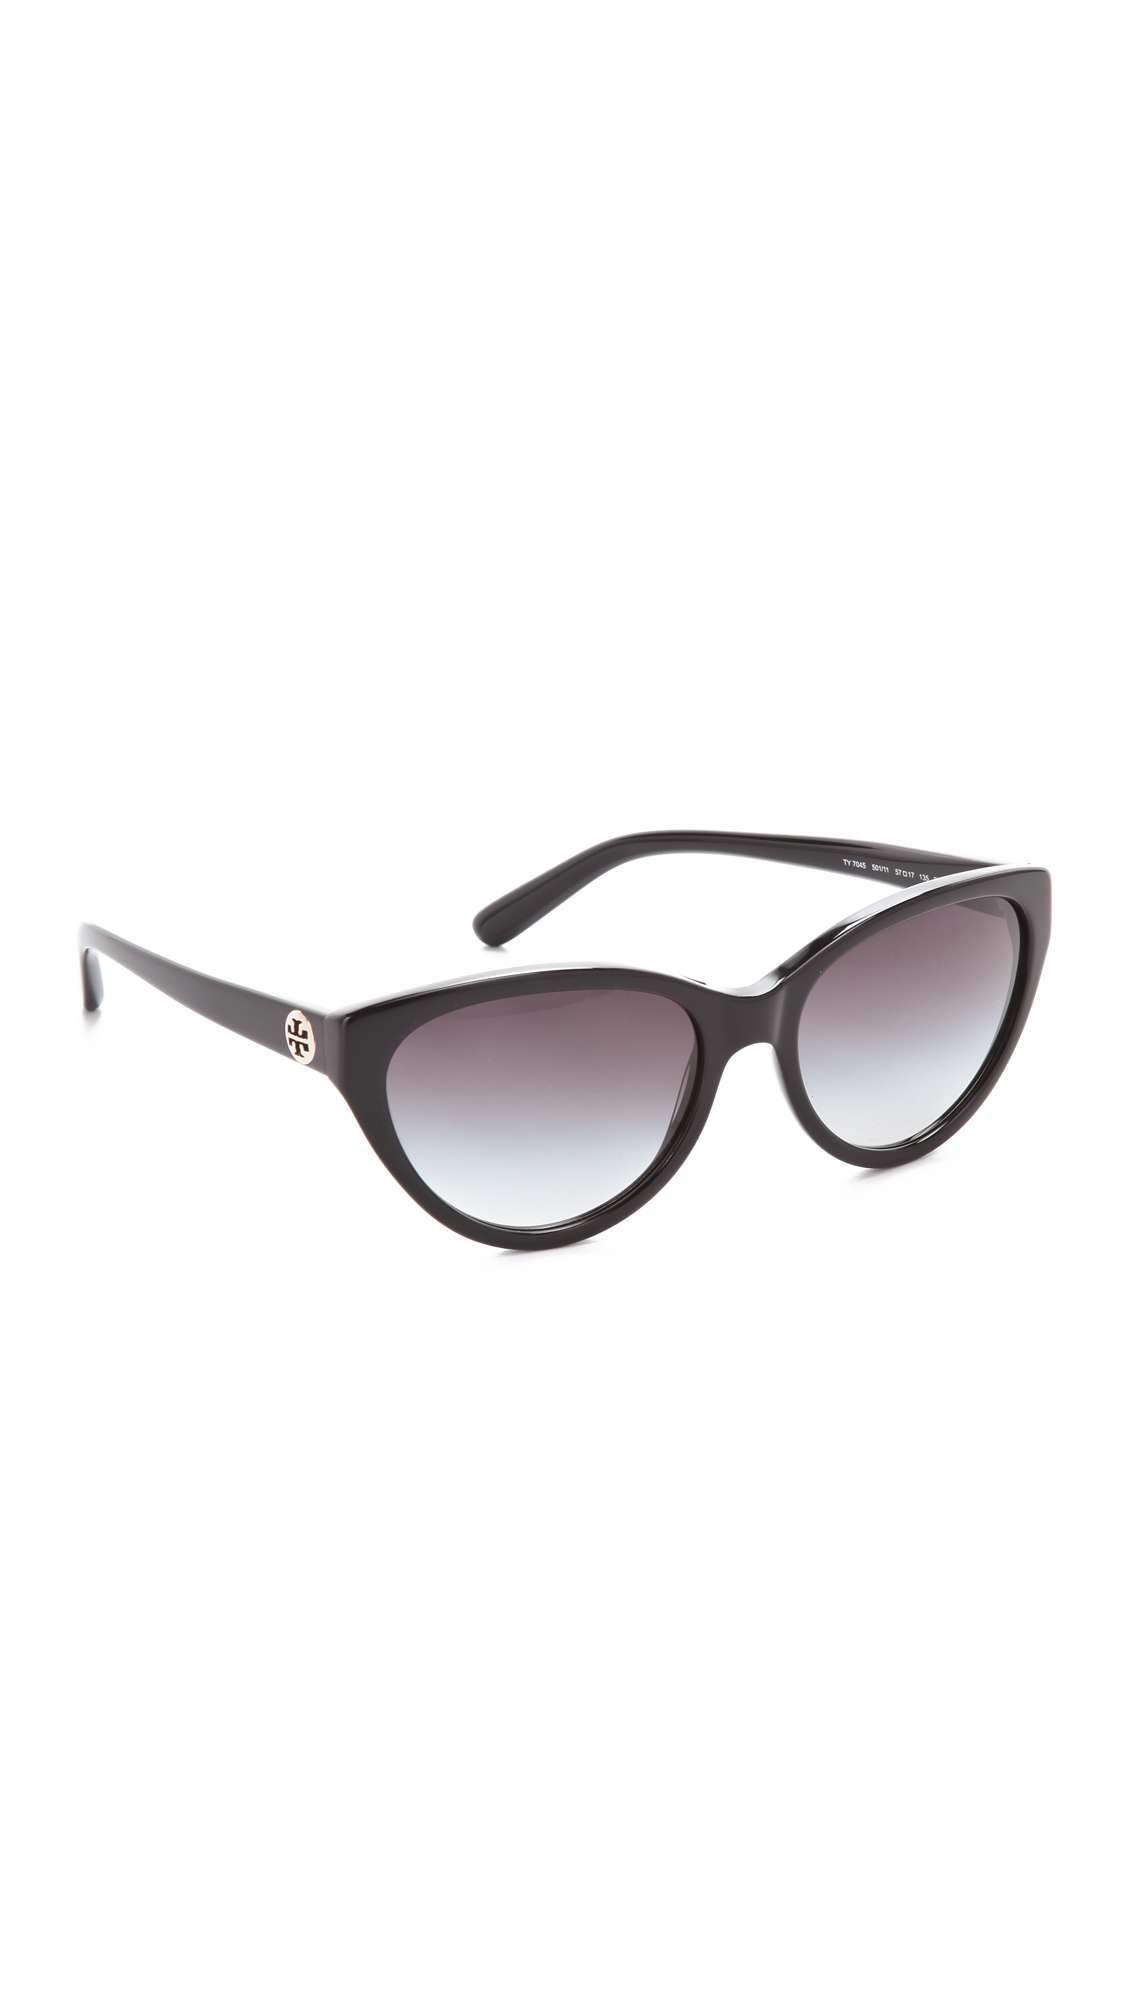 d1b424577 Tory Burch Cat Eye Sunglasses in Black - Lyst